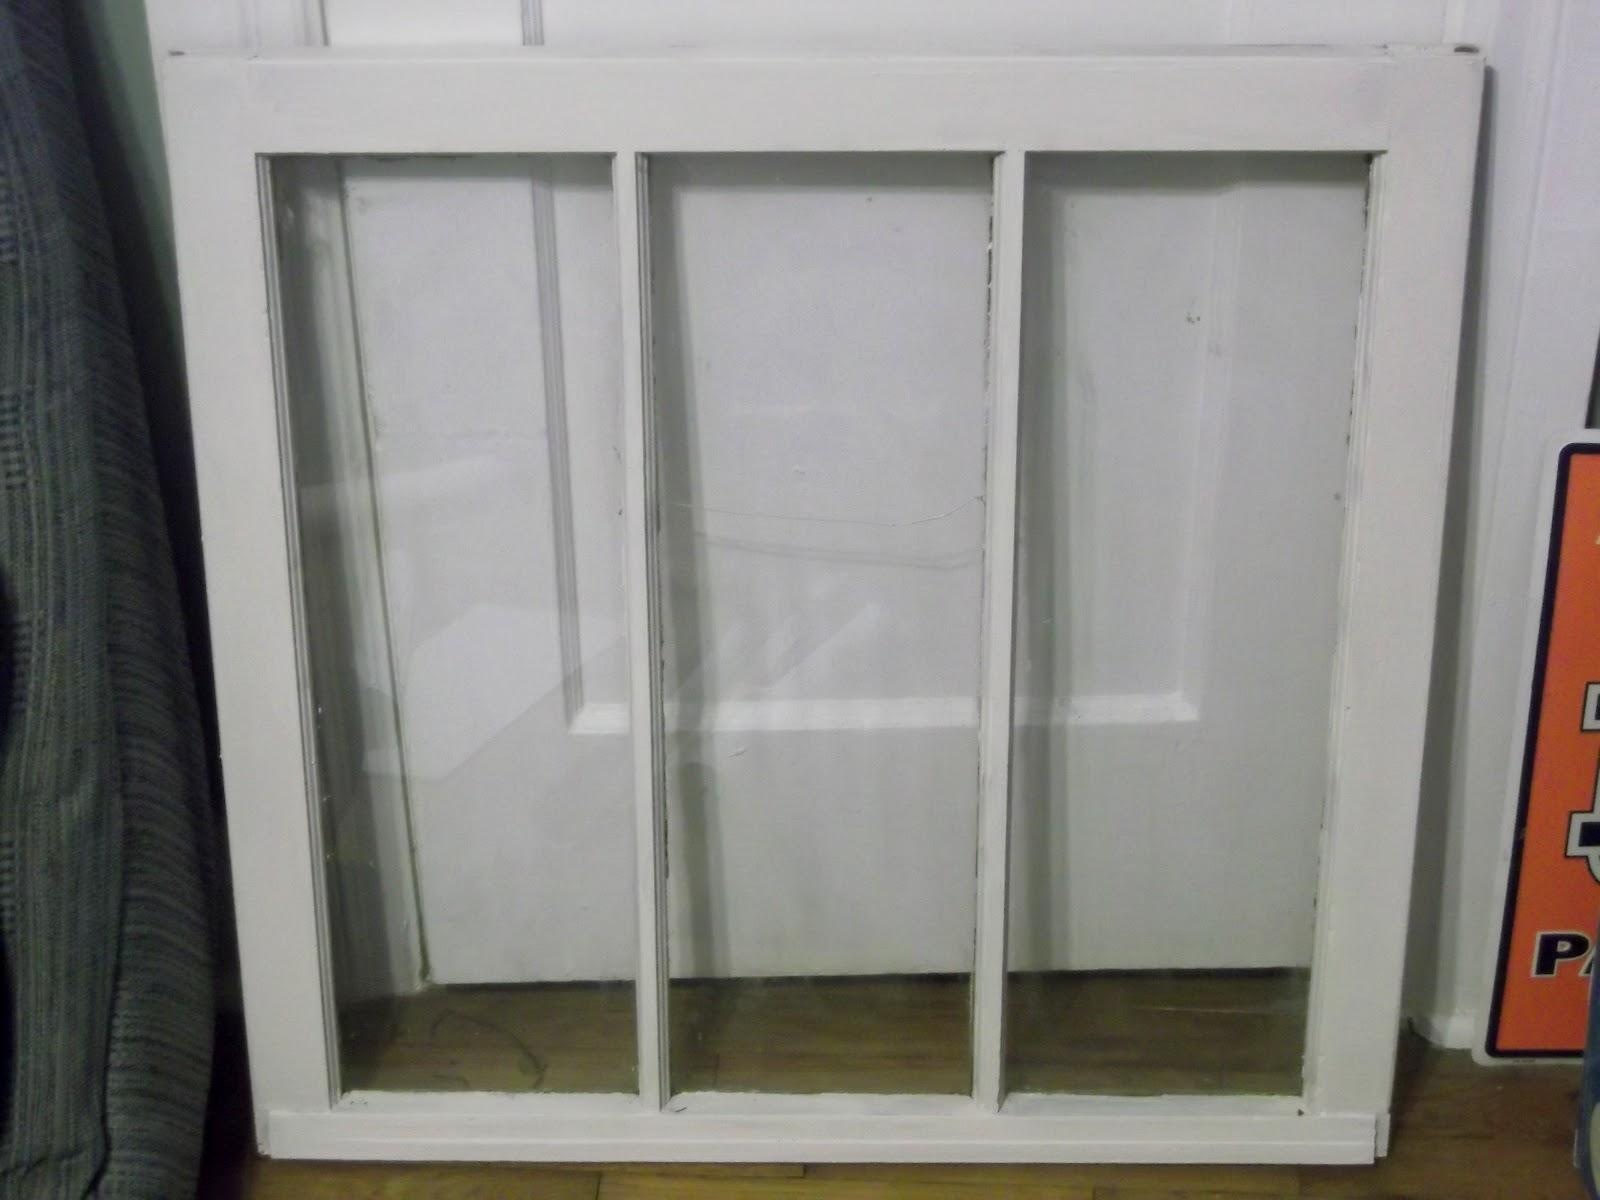 green pbnjs old window upcycle. Black Bedroom Furniture Sets. Home Design Ideas